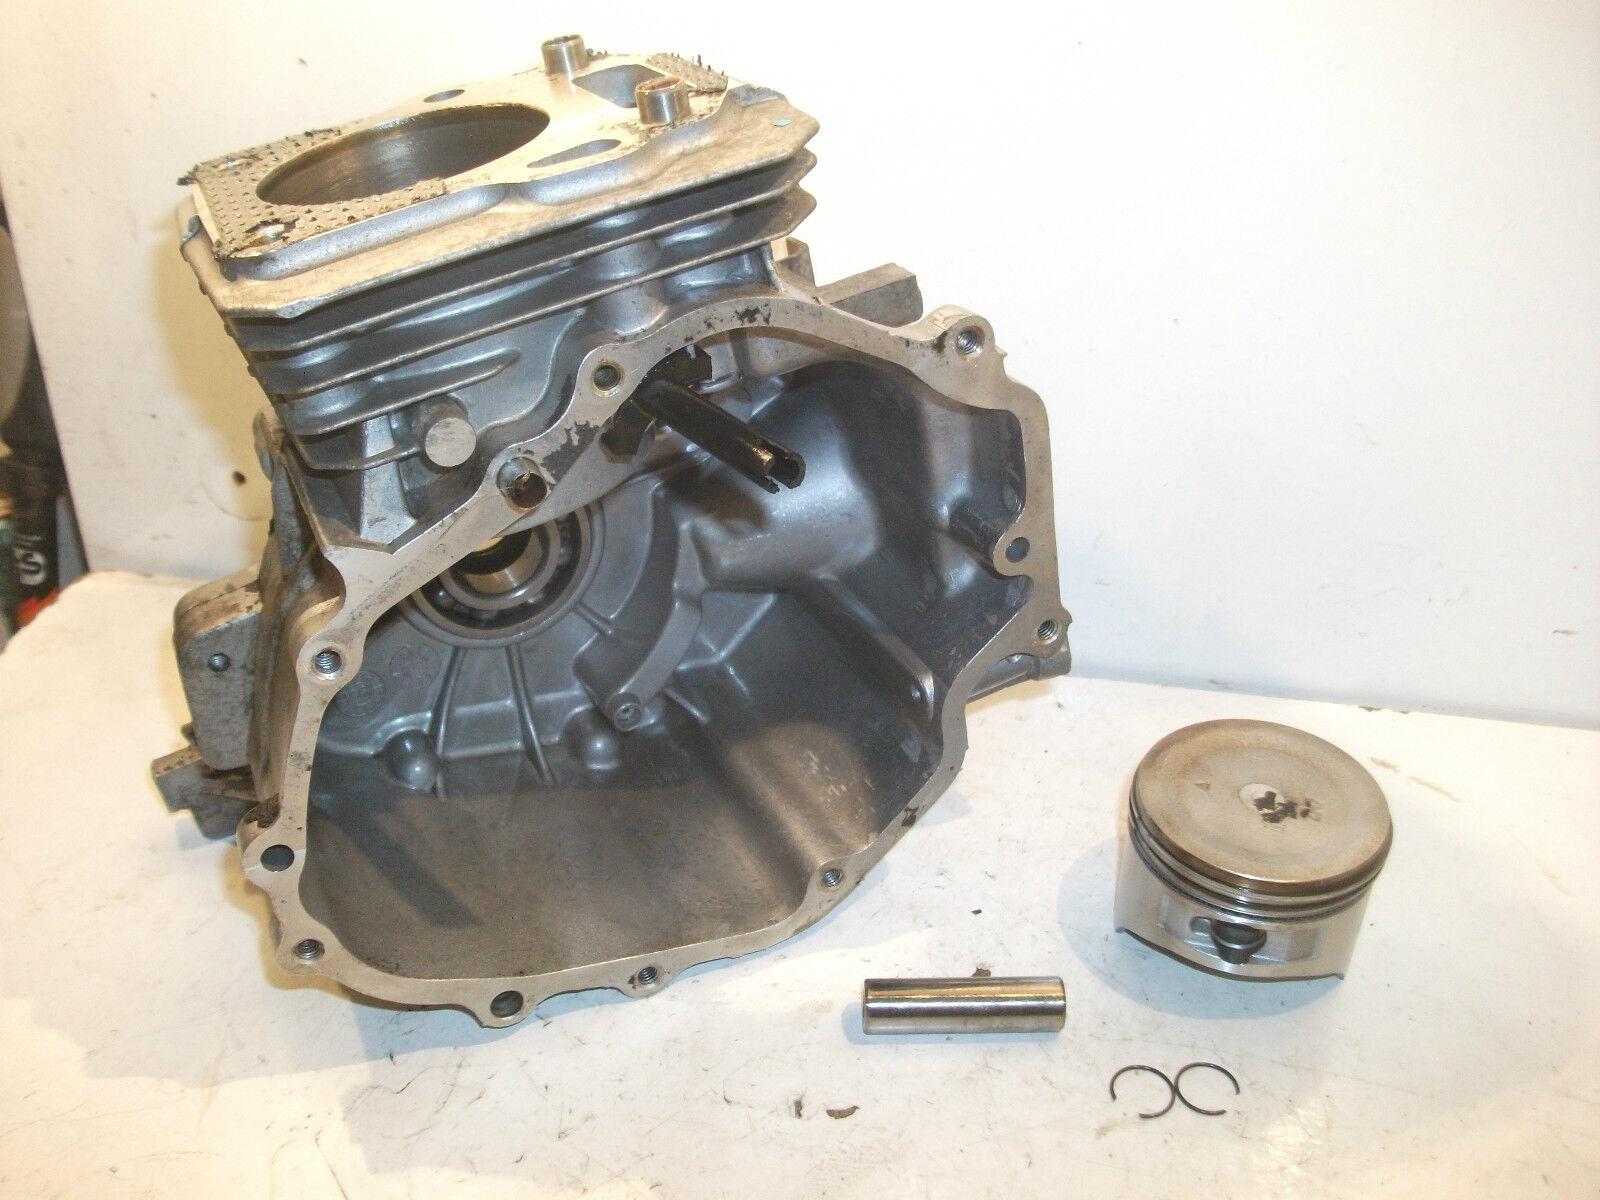 Moteur TOPOWER IP60   IP 60 - Cocheter moteur nu   cylindre piston